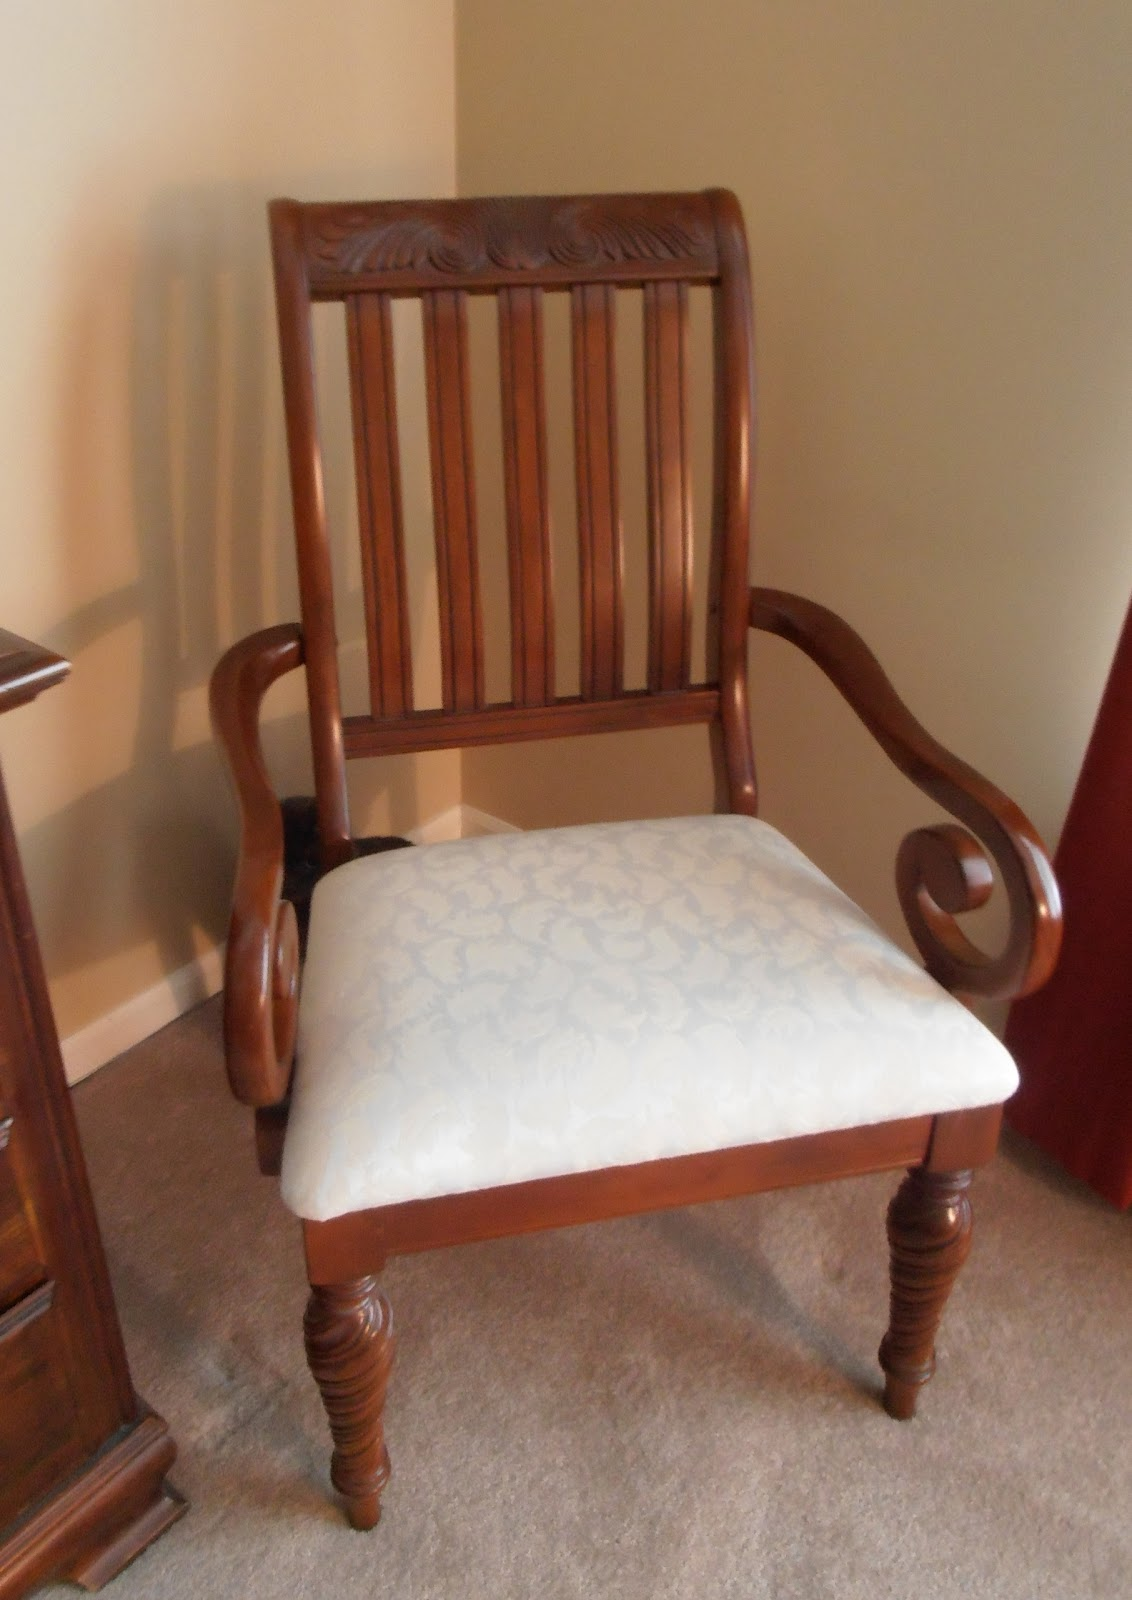 Chairfx Chair Covers Eu Swing Toronto Tallgrass Design Migration